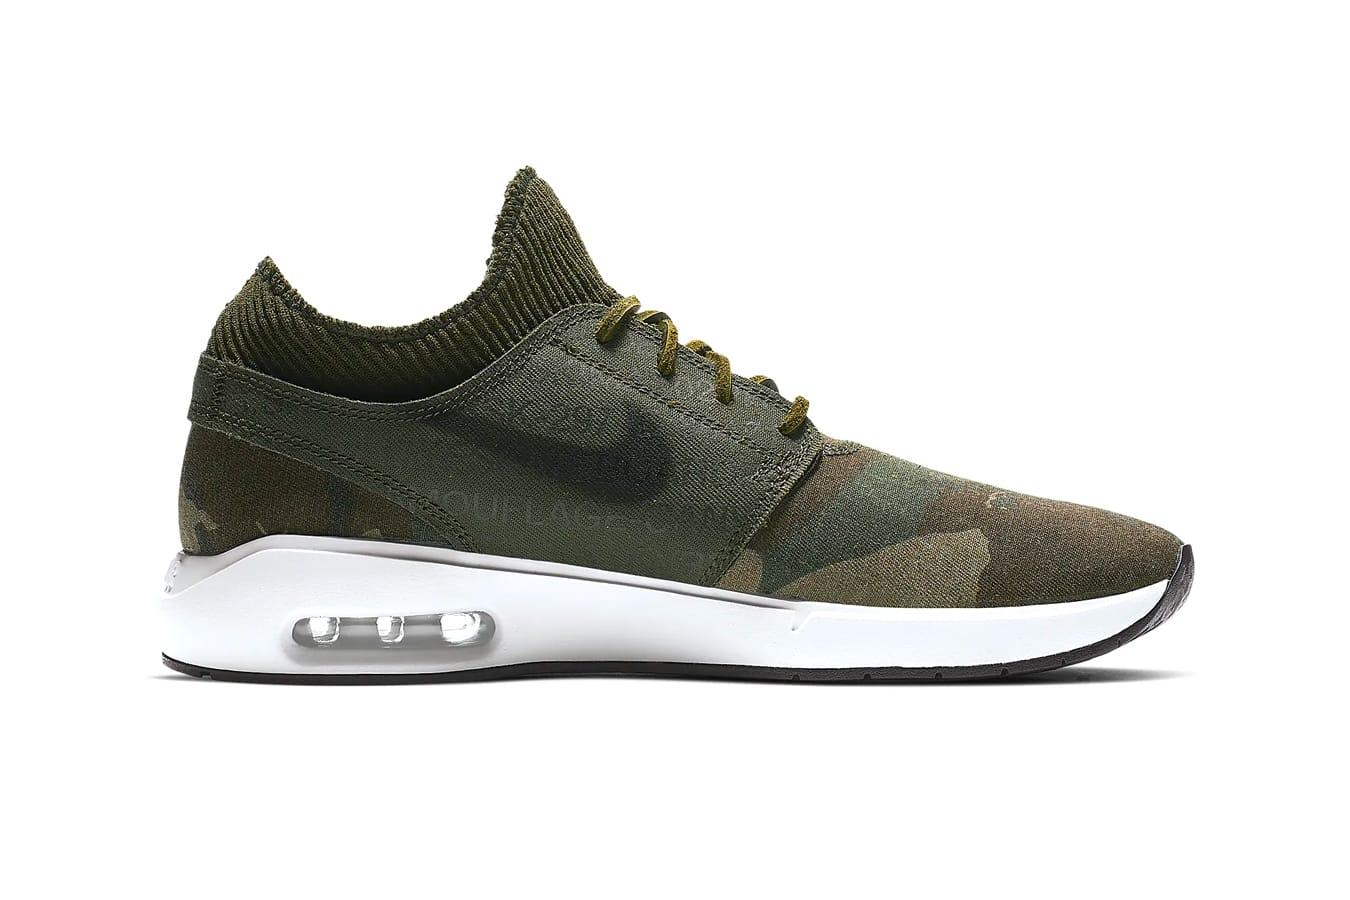 Nike SB Introduces the Janoski 2